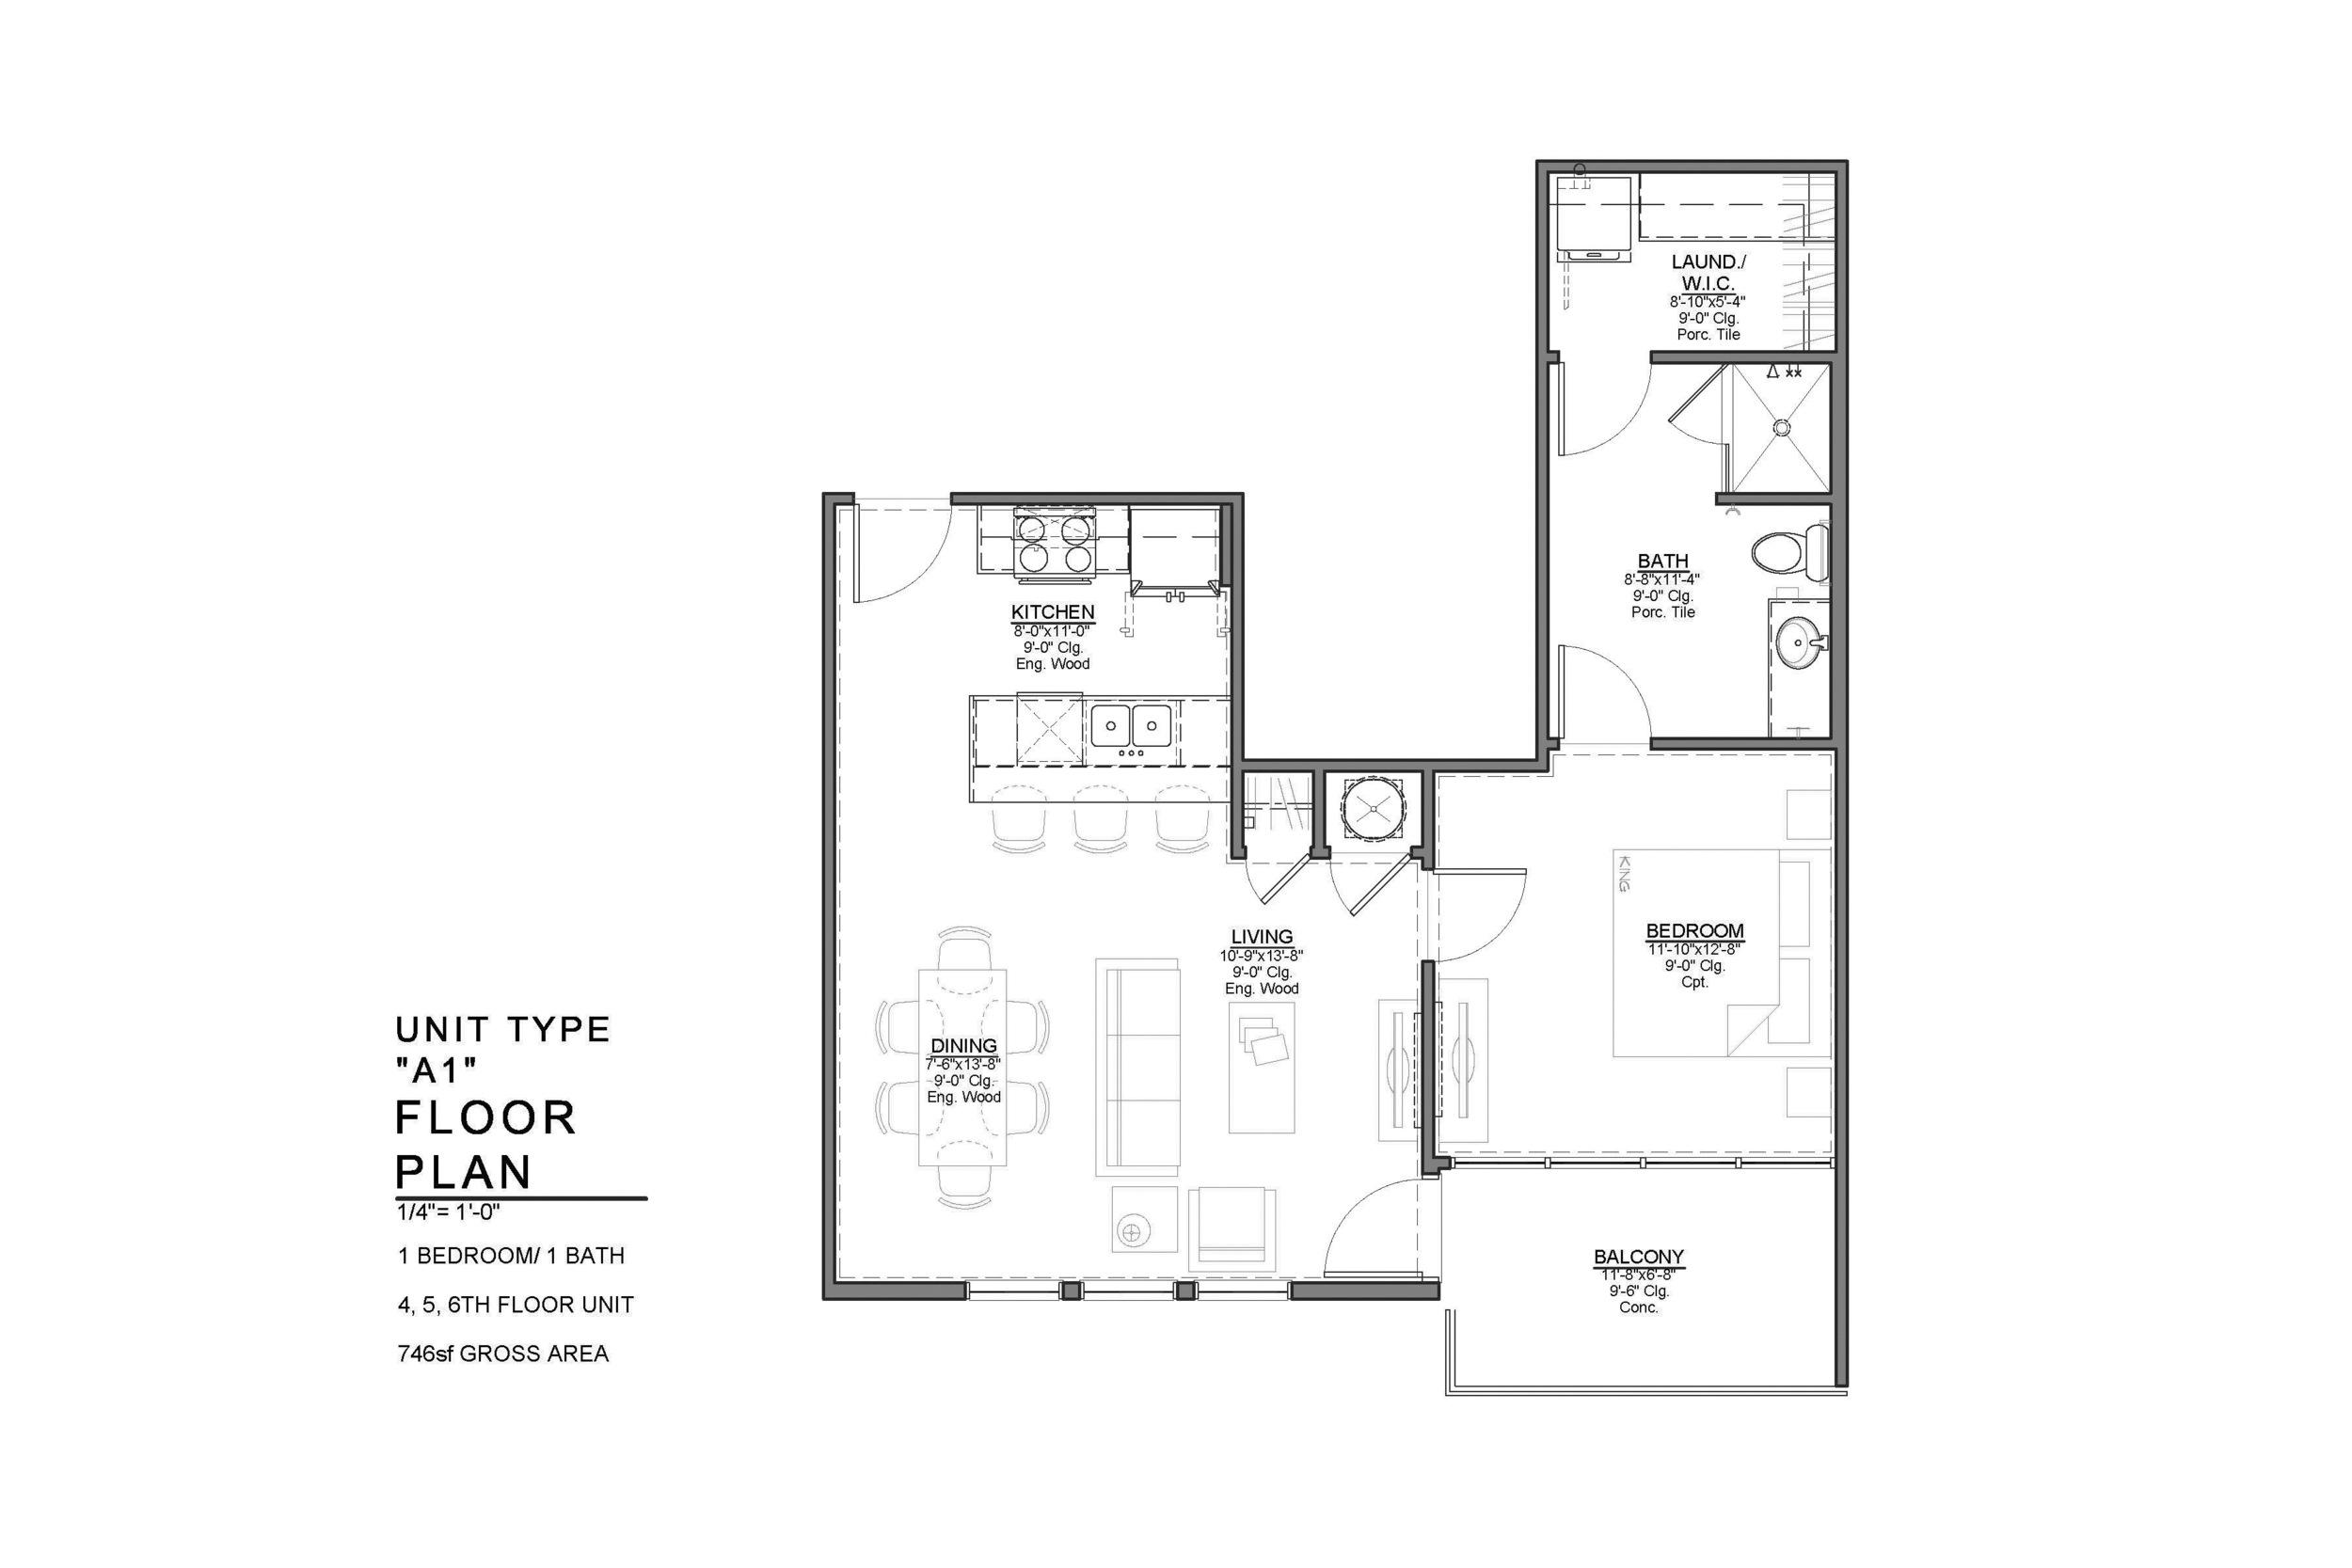 A1 FLOOR PLAN: 1 BEDROOM / 1 BATH